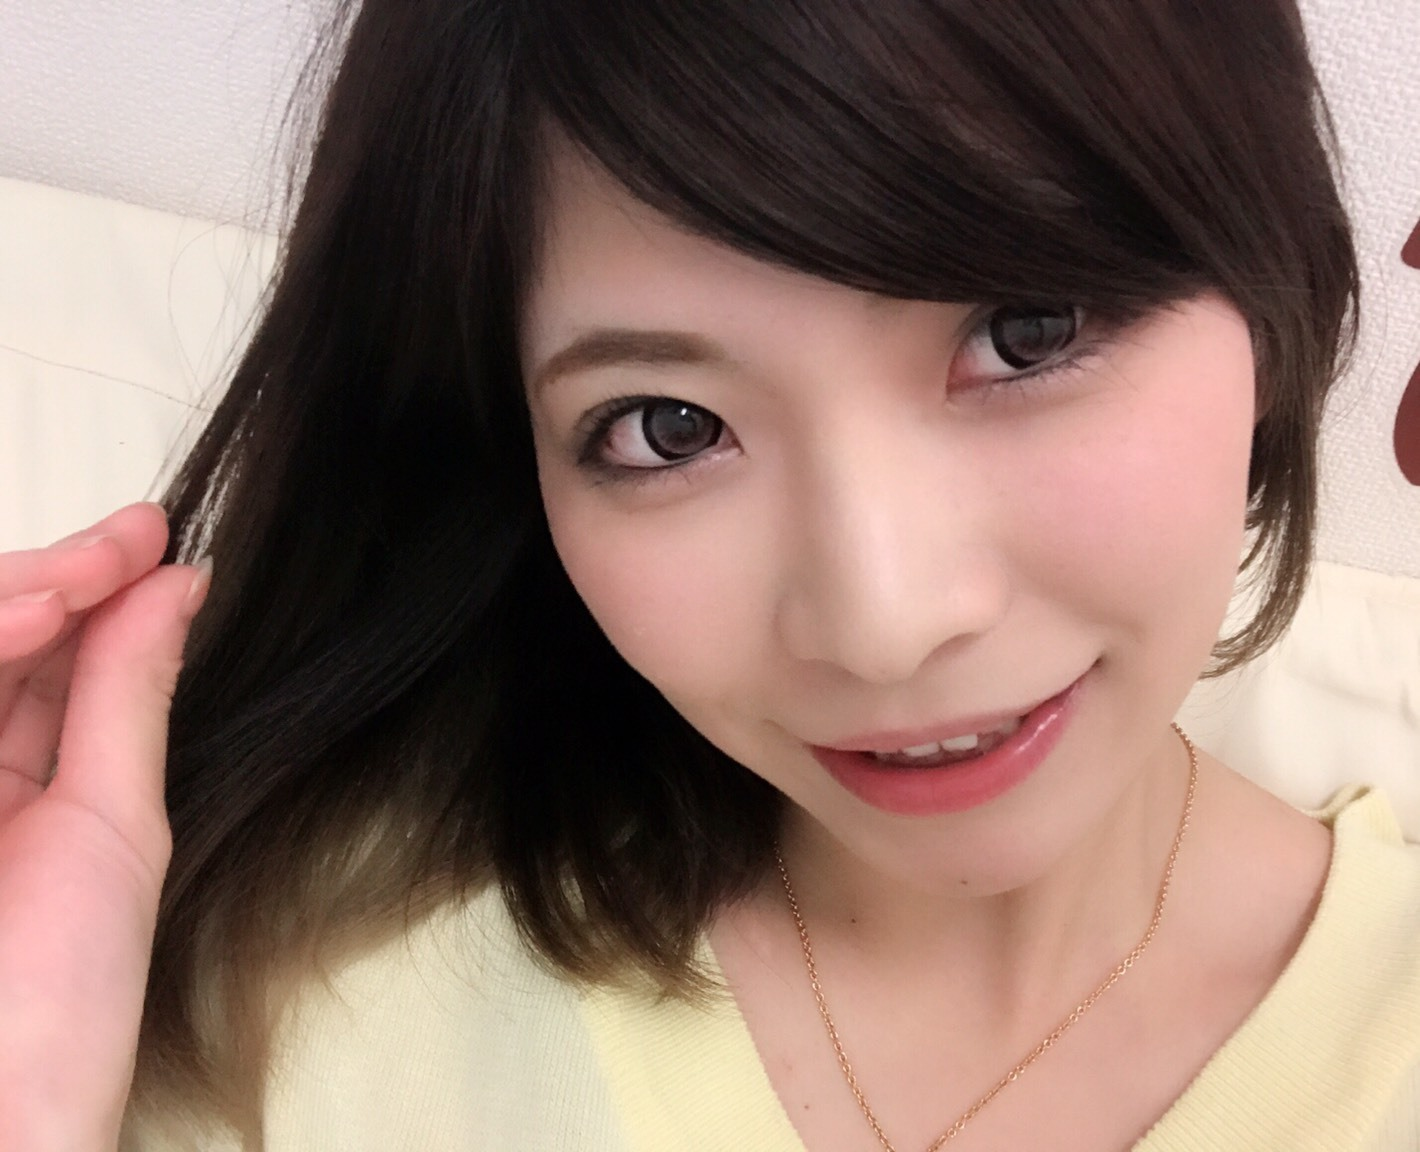 S__4087855.jpg